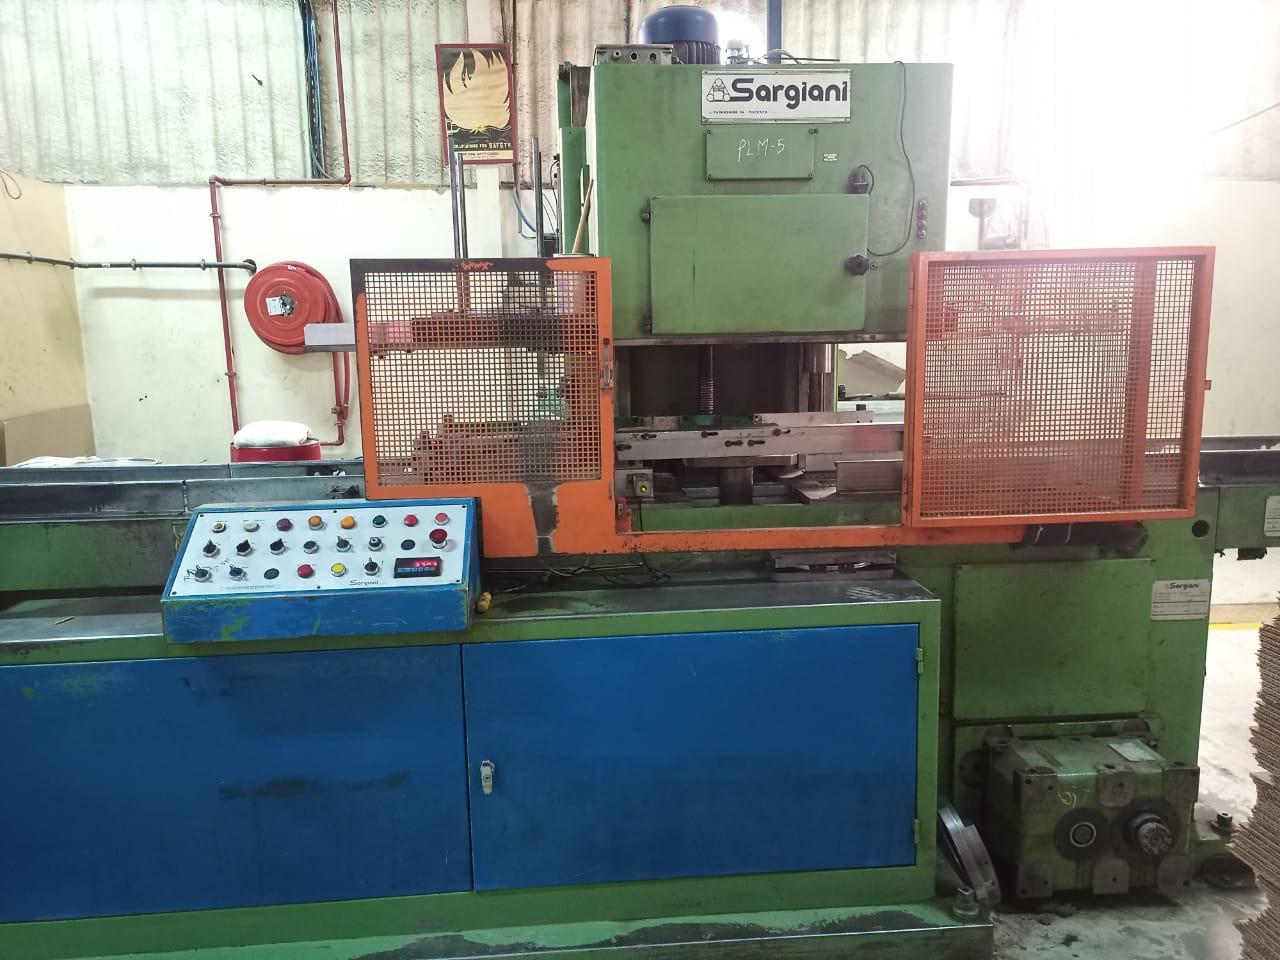 Sargiani S2012 A101 seaming machine